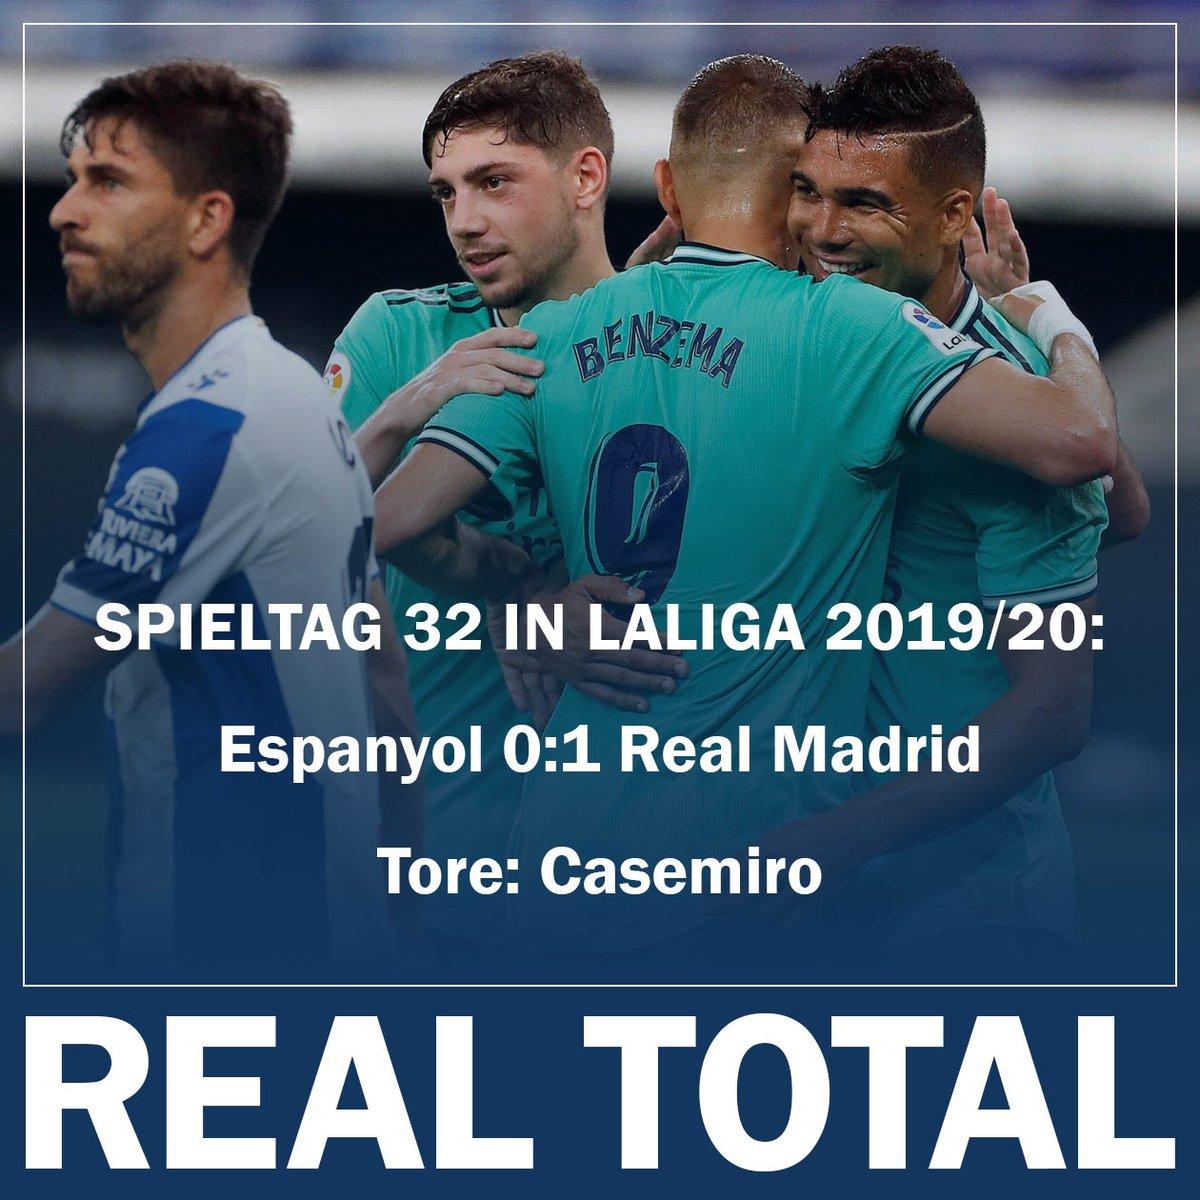 #EspanyolRealMadrid